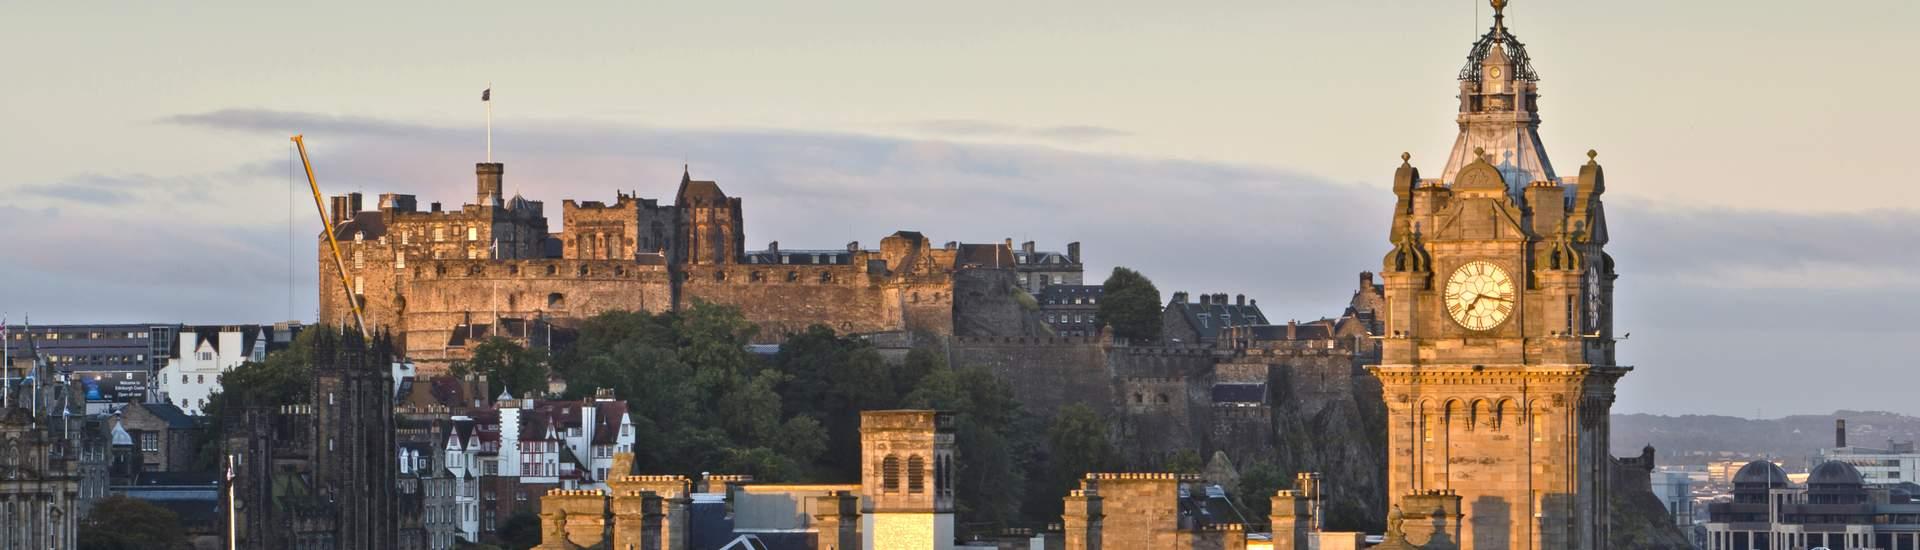 Viajes de Inglés en Familia a Edimburgo, Escocia